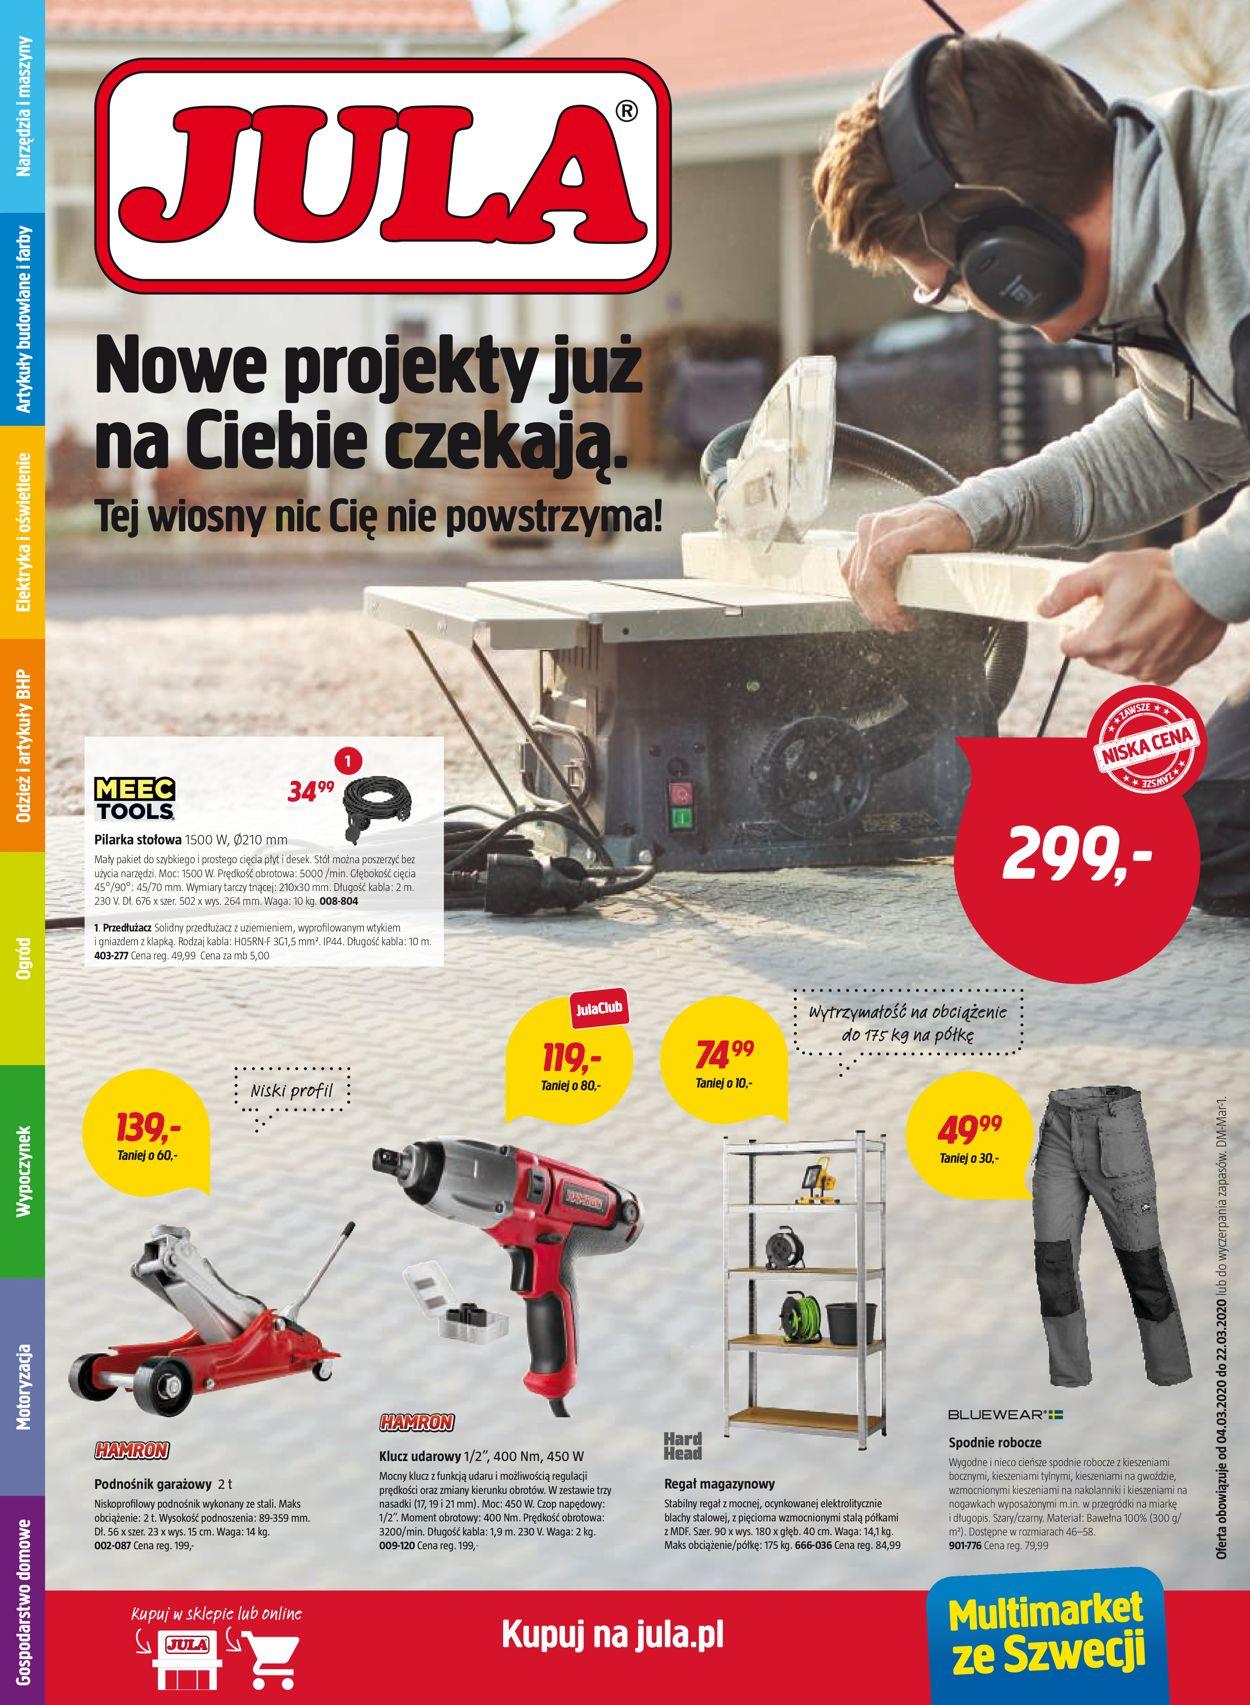 Gazetka promocyjna Jula - 04.03-22.03.2020